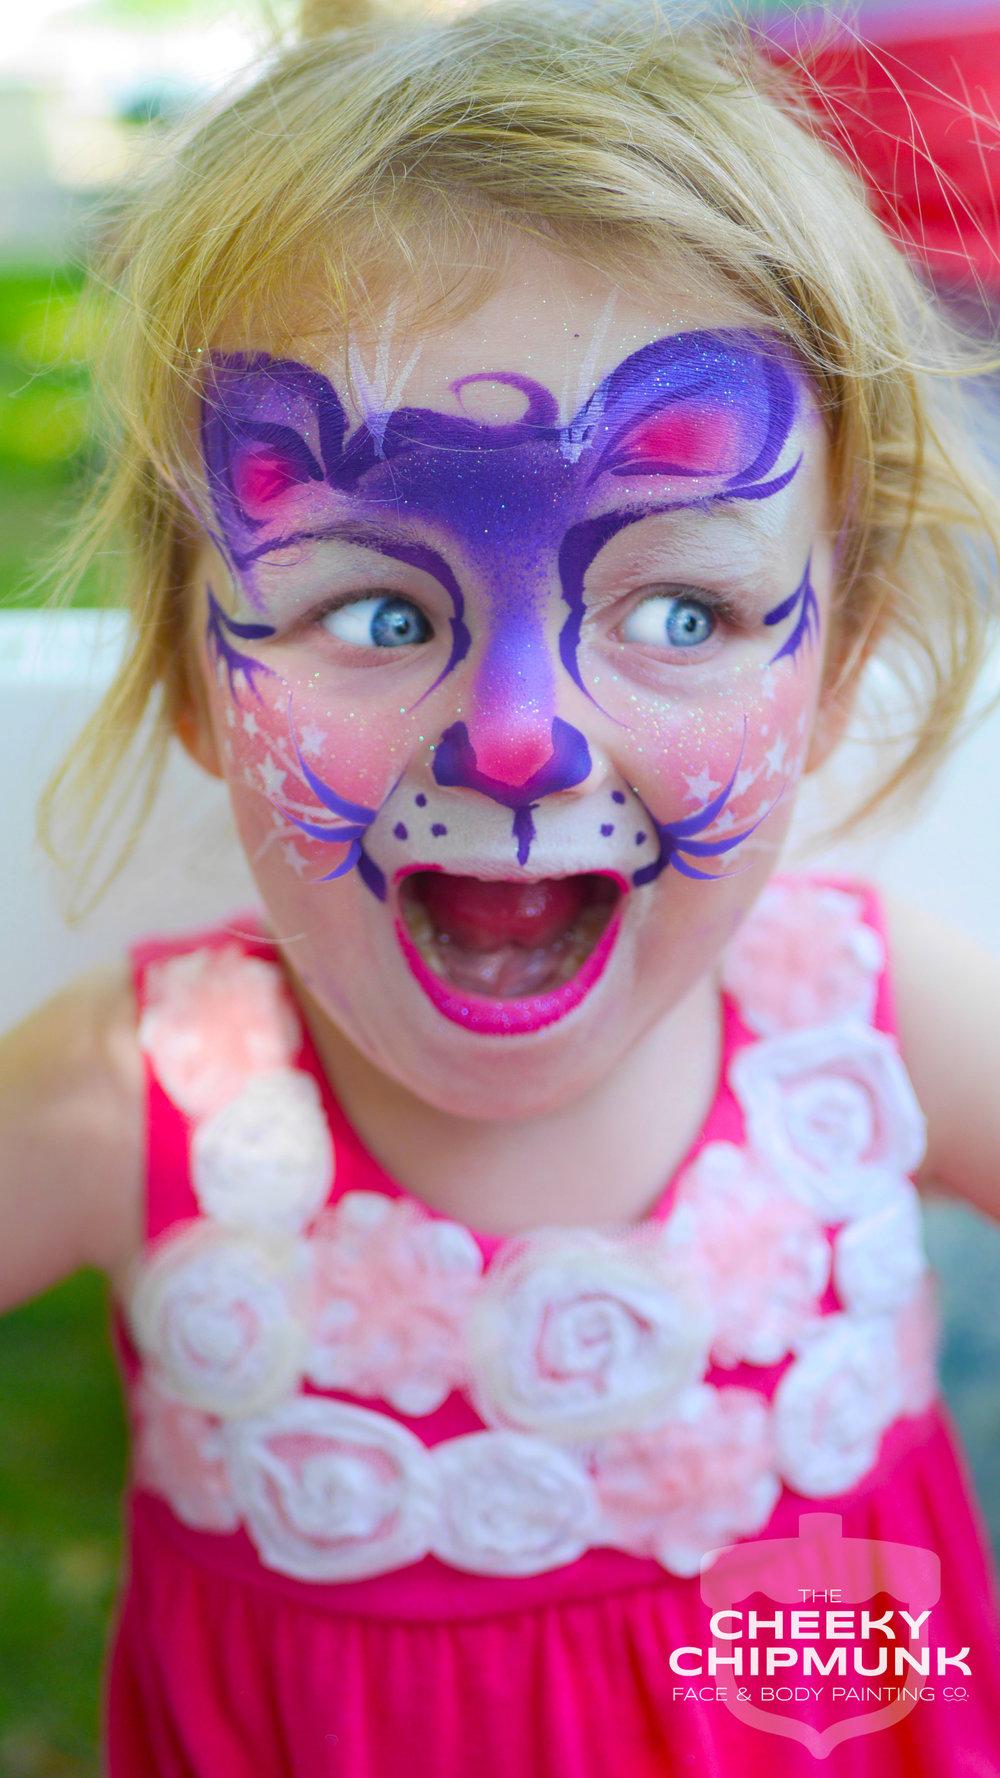 Pink_purple_kitty_cat_kitten_facepainting_lenorekoppelman_thecheekychipmunk_mompreneurs_astoria_park_2.jpg